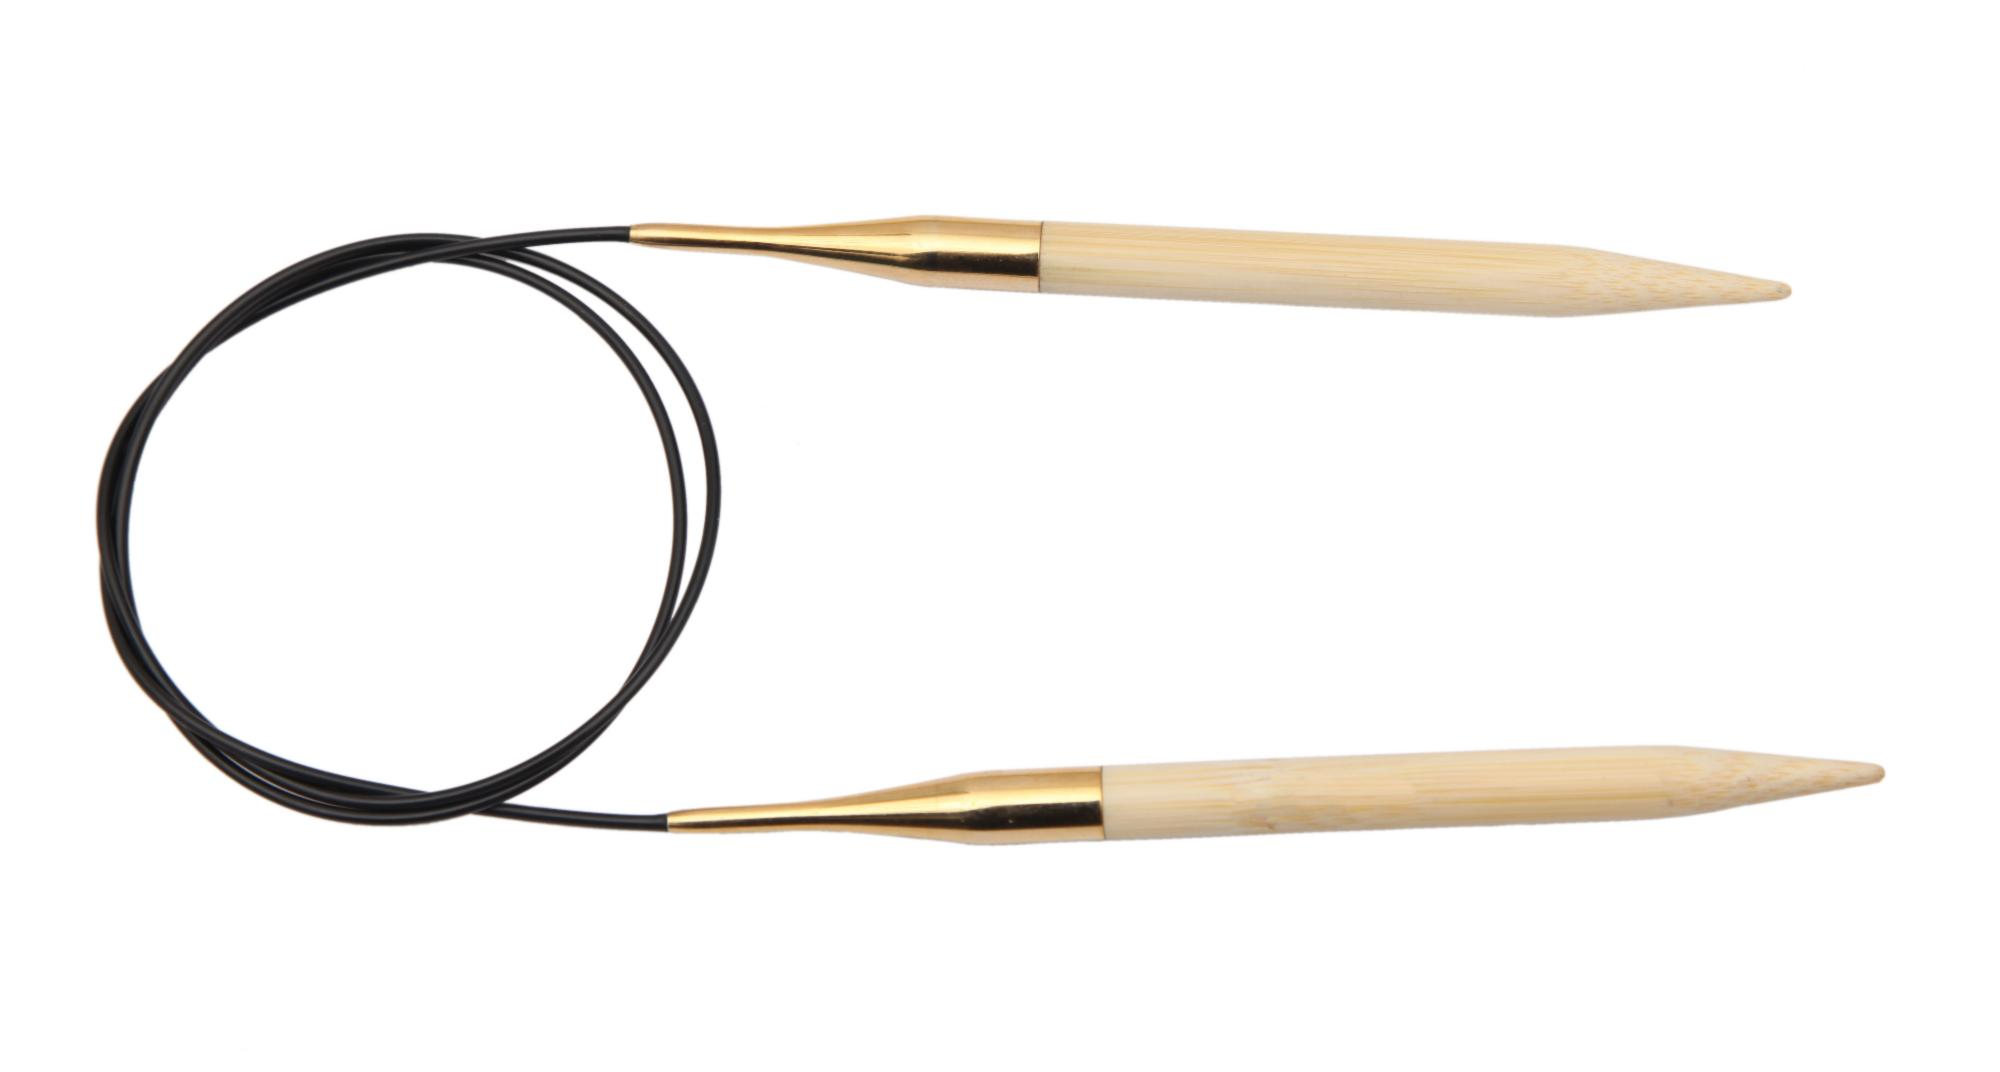 Спицы круговые 80 см Bamboo KnitPro, 22244, 2.75 мм